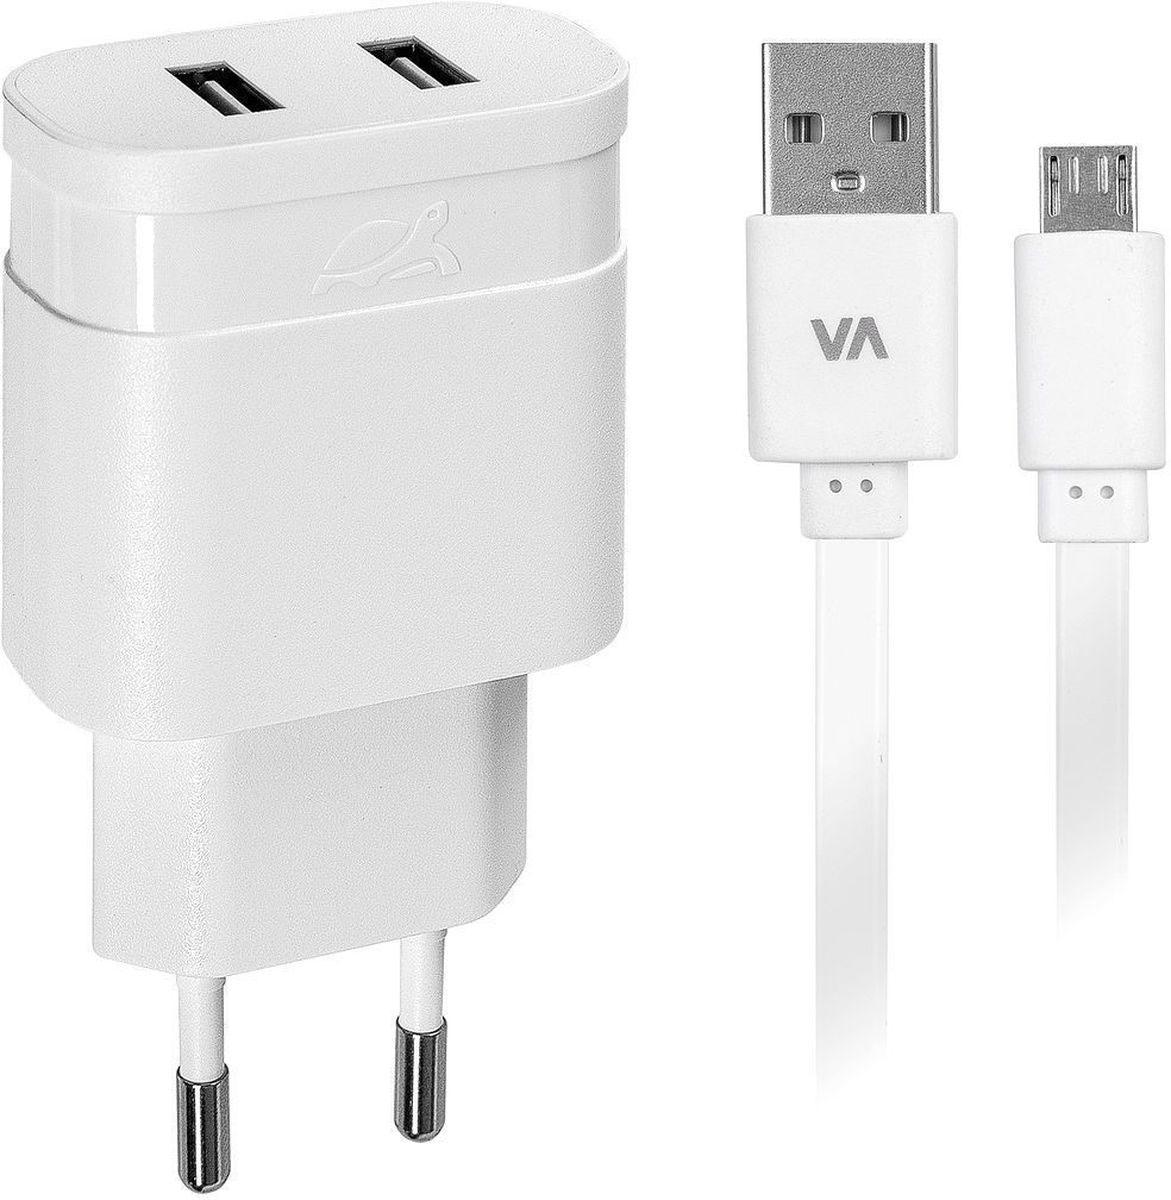 Rivapower VA4122 WD1, White сетевое зарядное устройствоVA4122 WD1